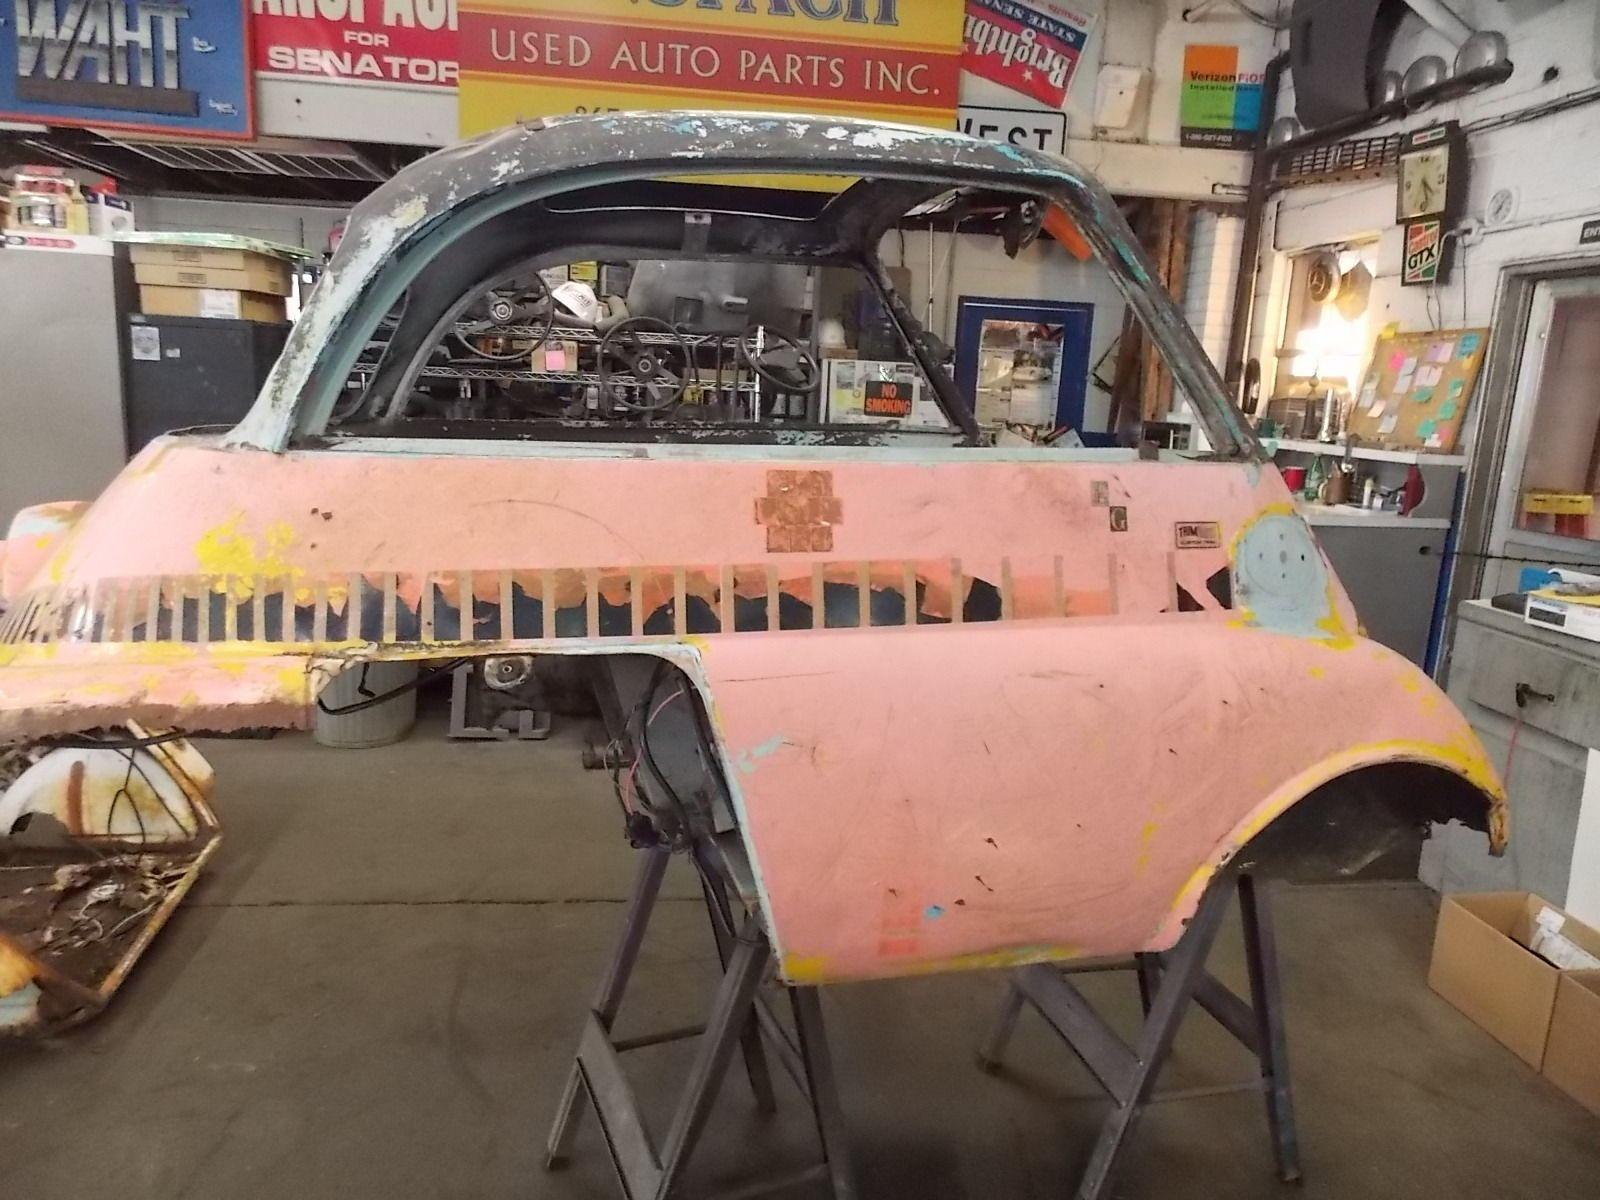 eBay 1958 BMW Isetta Pink BMW Isetta Body shell Bare Body stripped